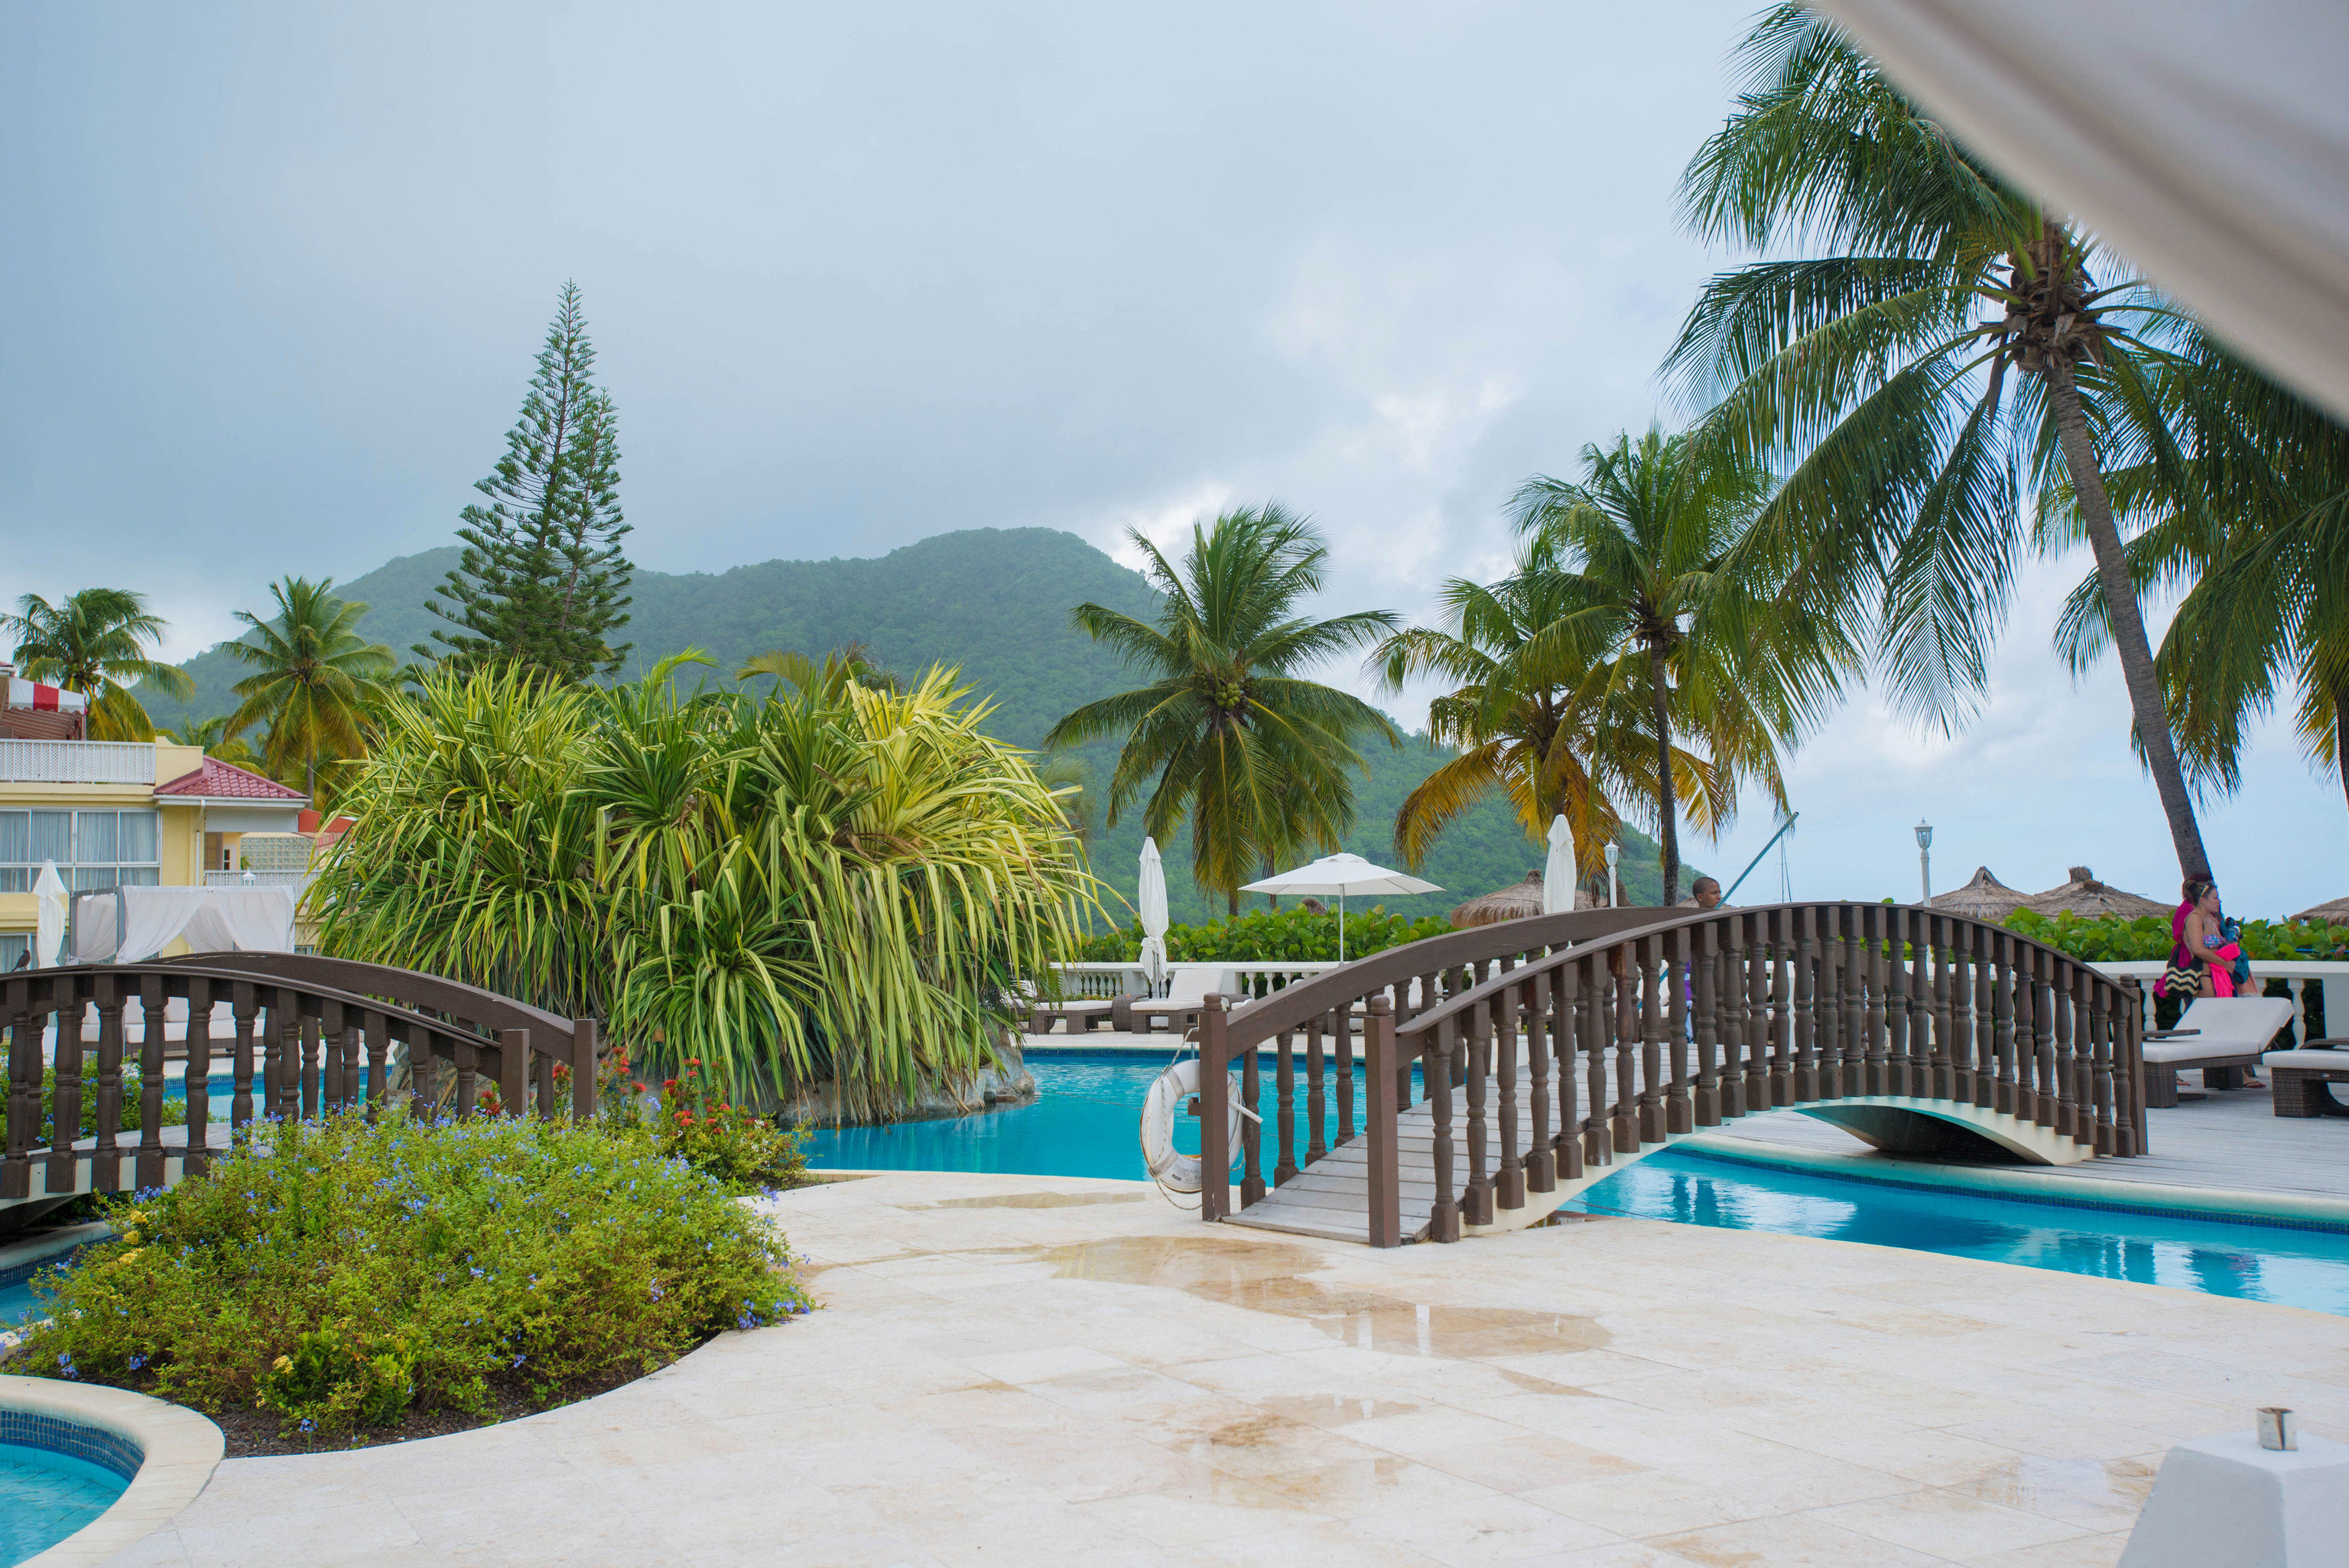 tree palm Pool Resort leisure property caribbean swimming pool Beach plant arecales Villa tropics condominium Garden swimming lined